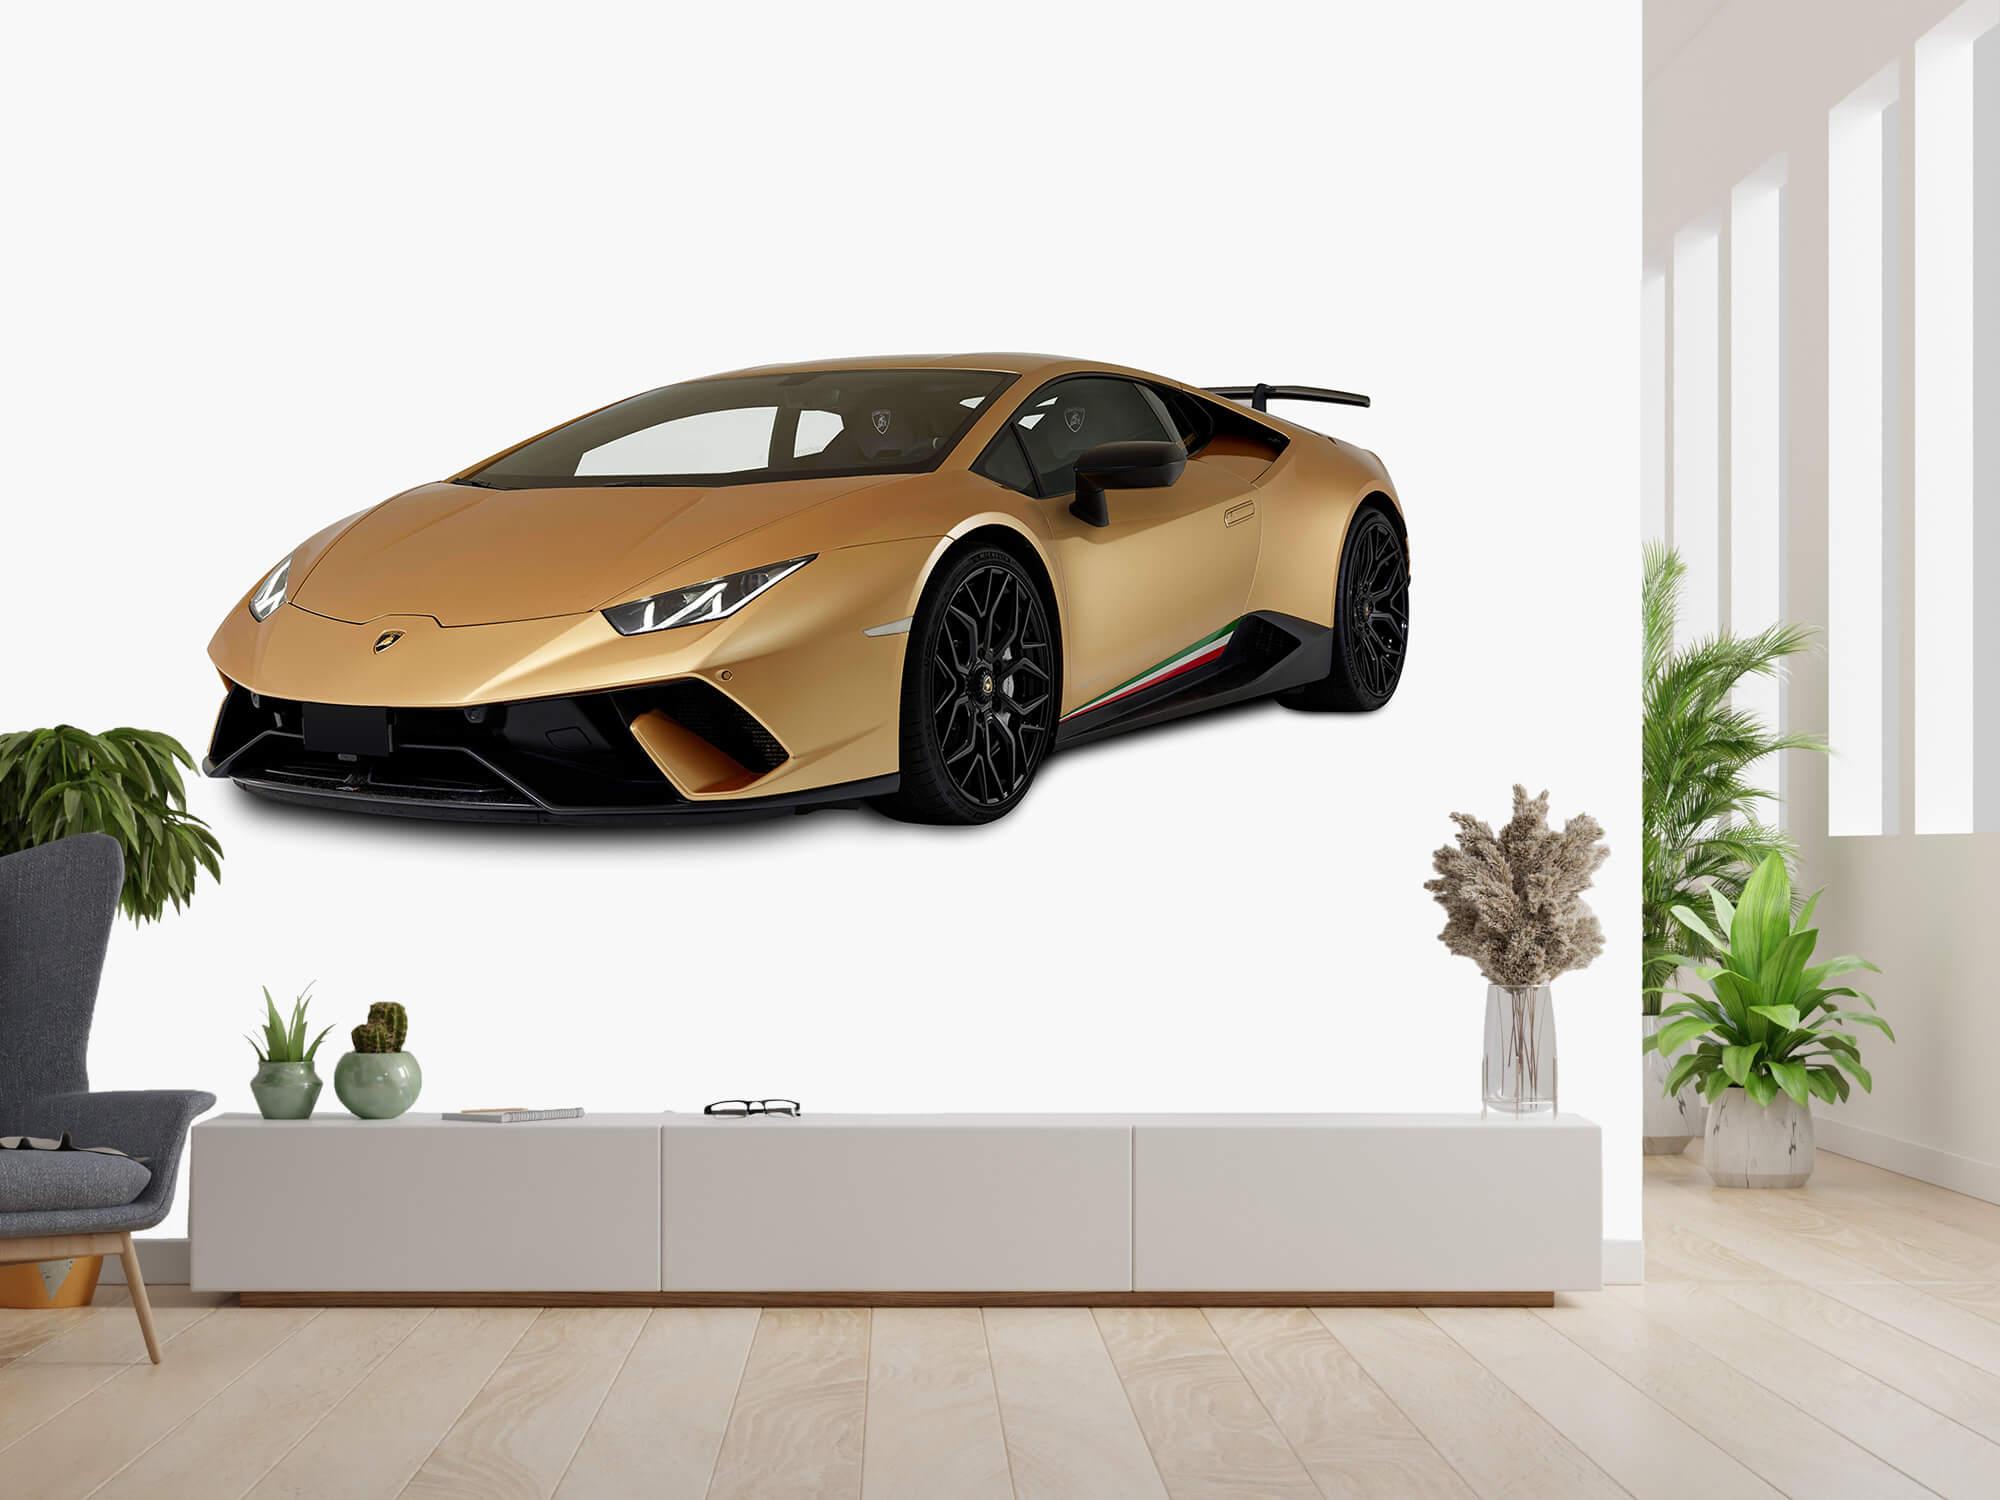 Wallpaper Lamborghini Huracán - Rechter voorkant wit 14